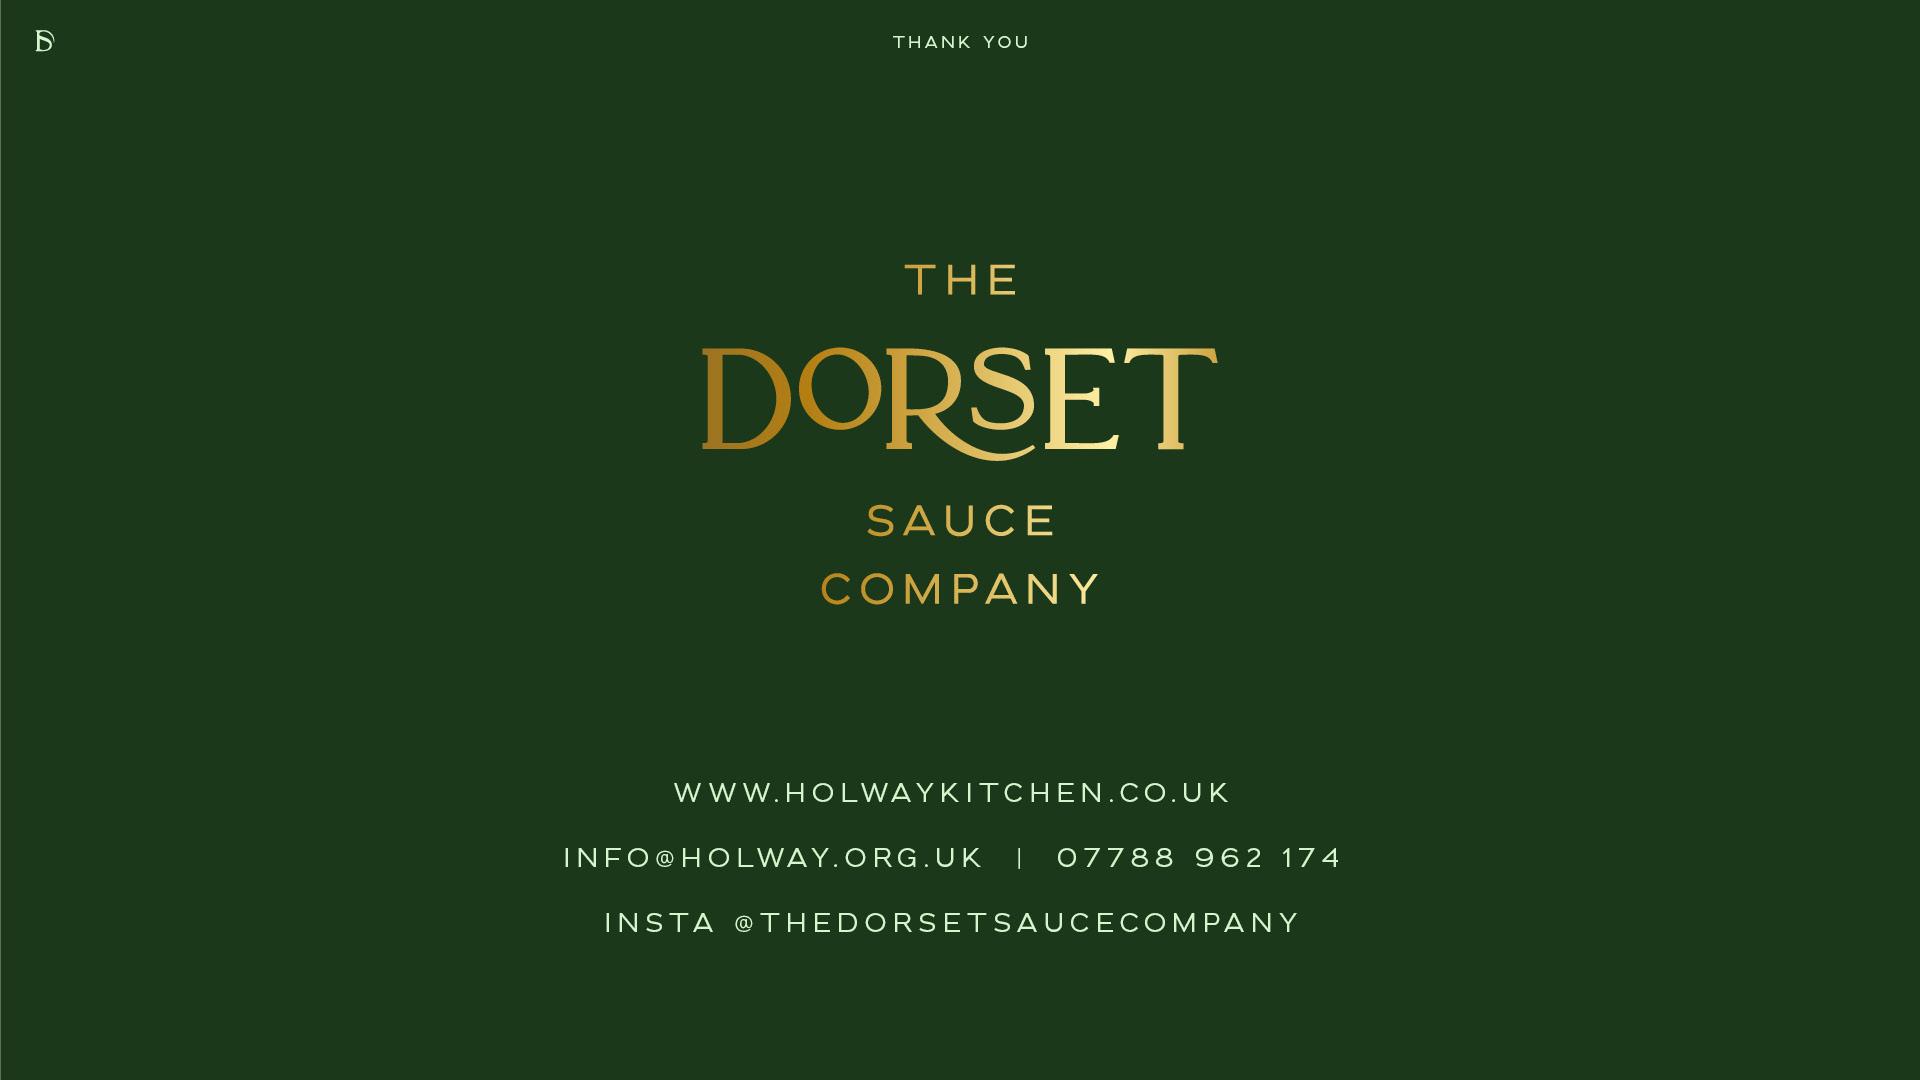 The Dorset Sauce Company - Contact Details